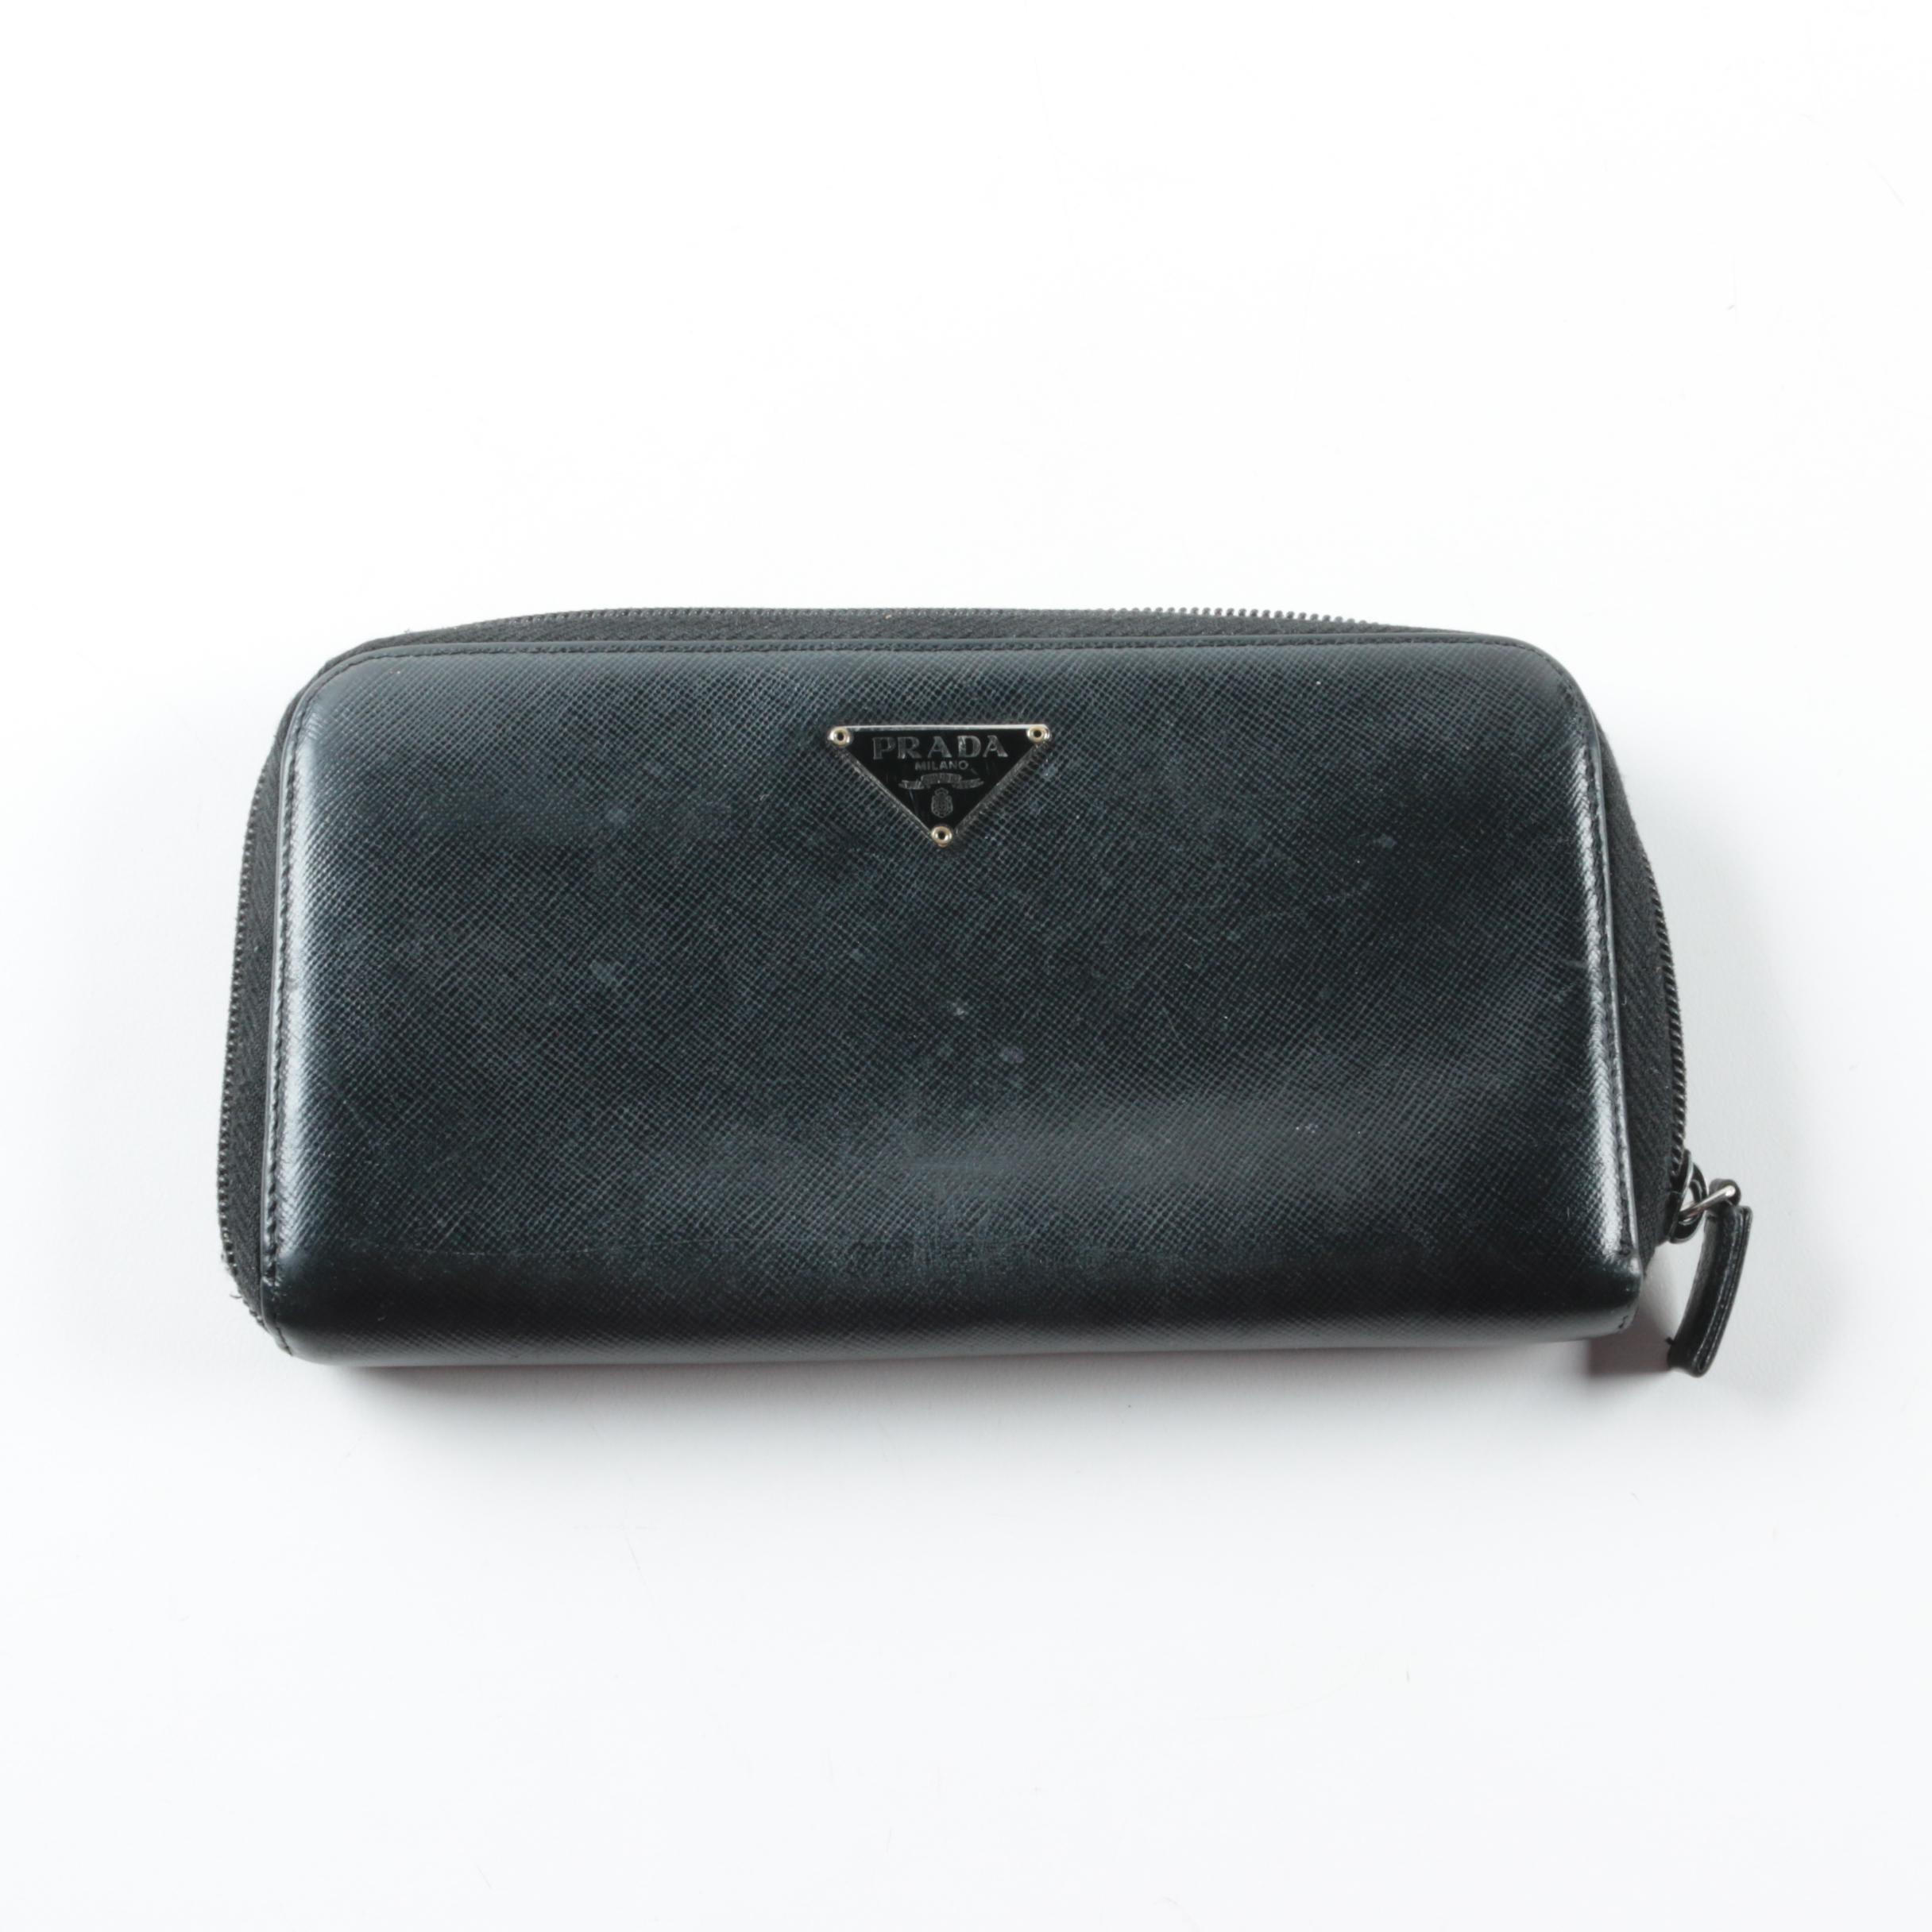 Prada Saffiano Zippered Clutch Wallet